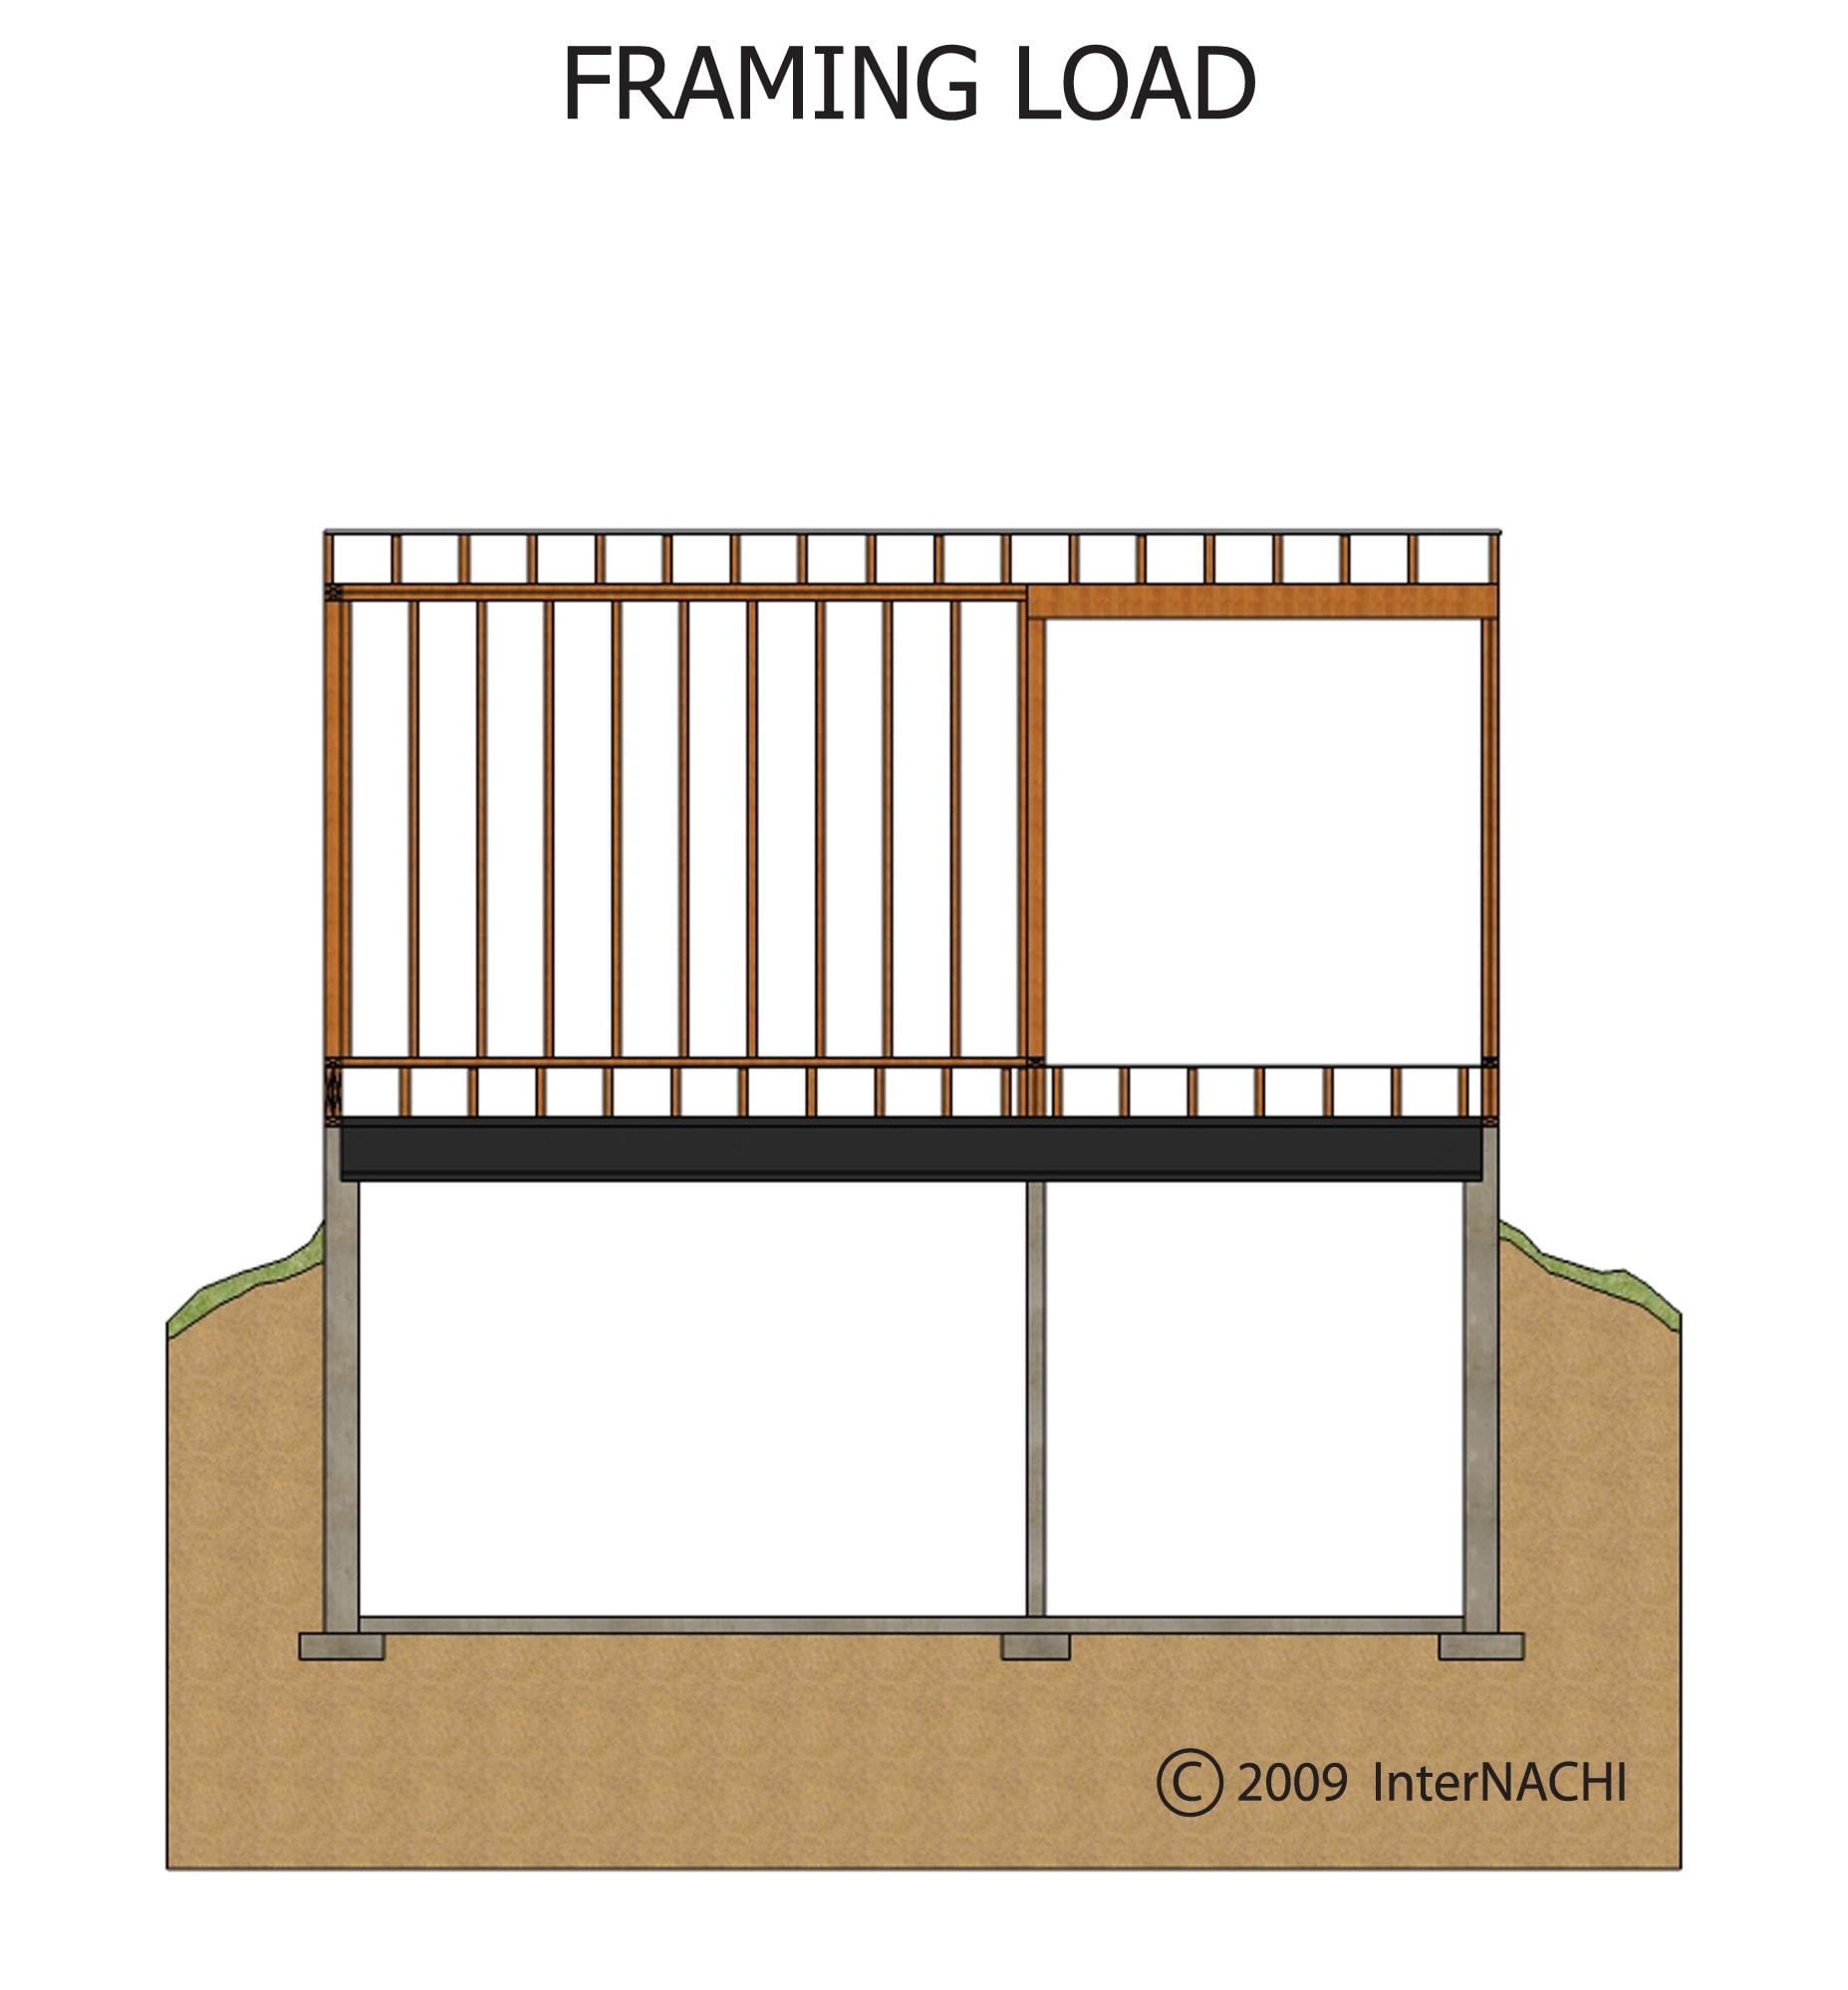 Framing load.